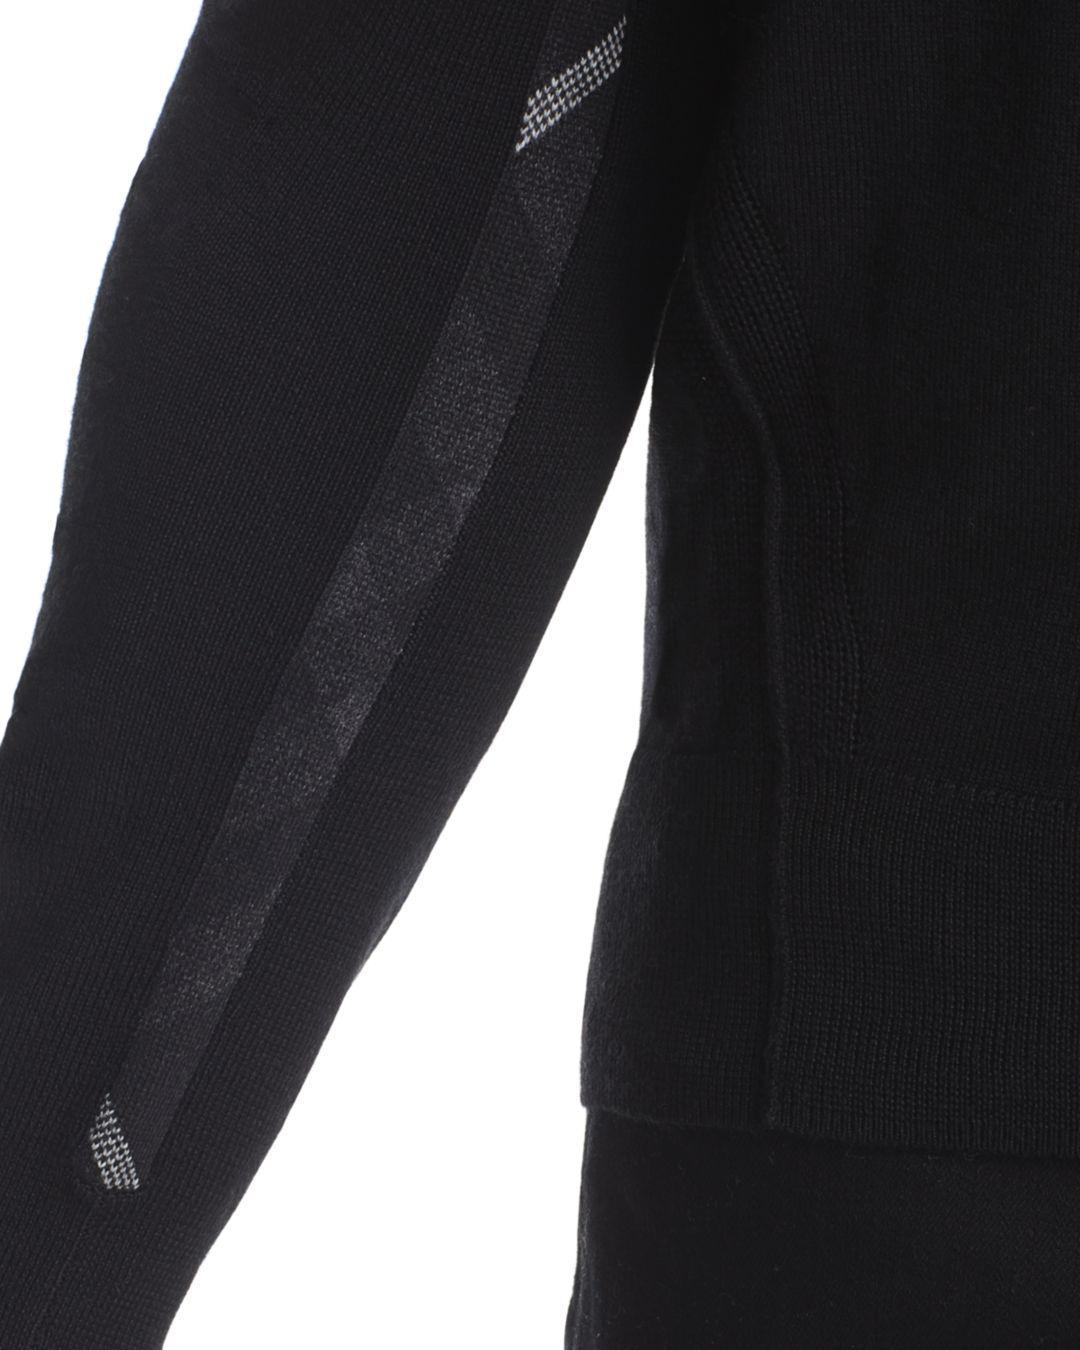 48105b7e0 Lyst - Burberry Carter Crewneck Sweater in Black for Men